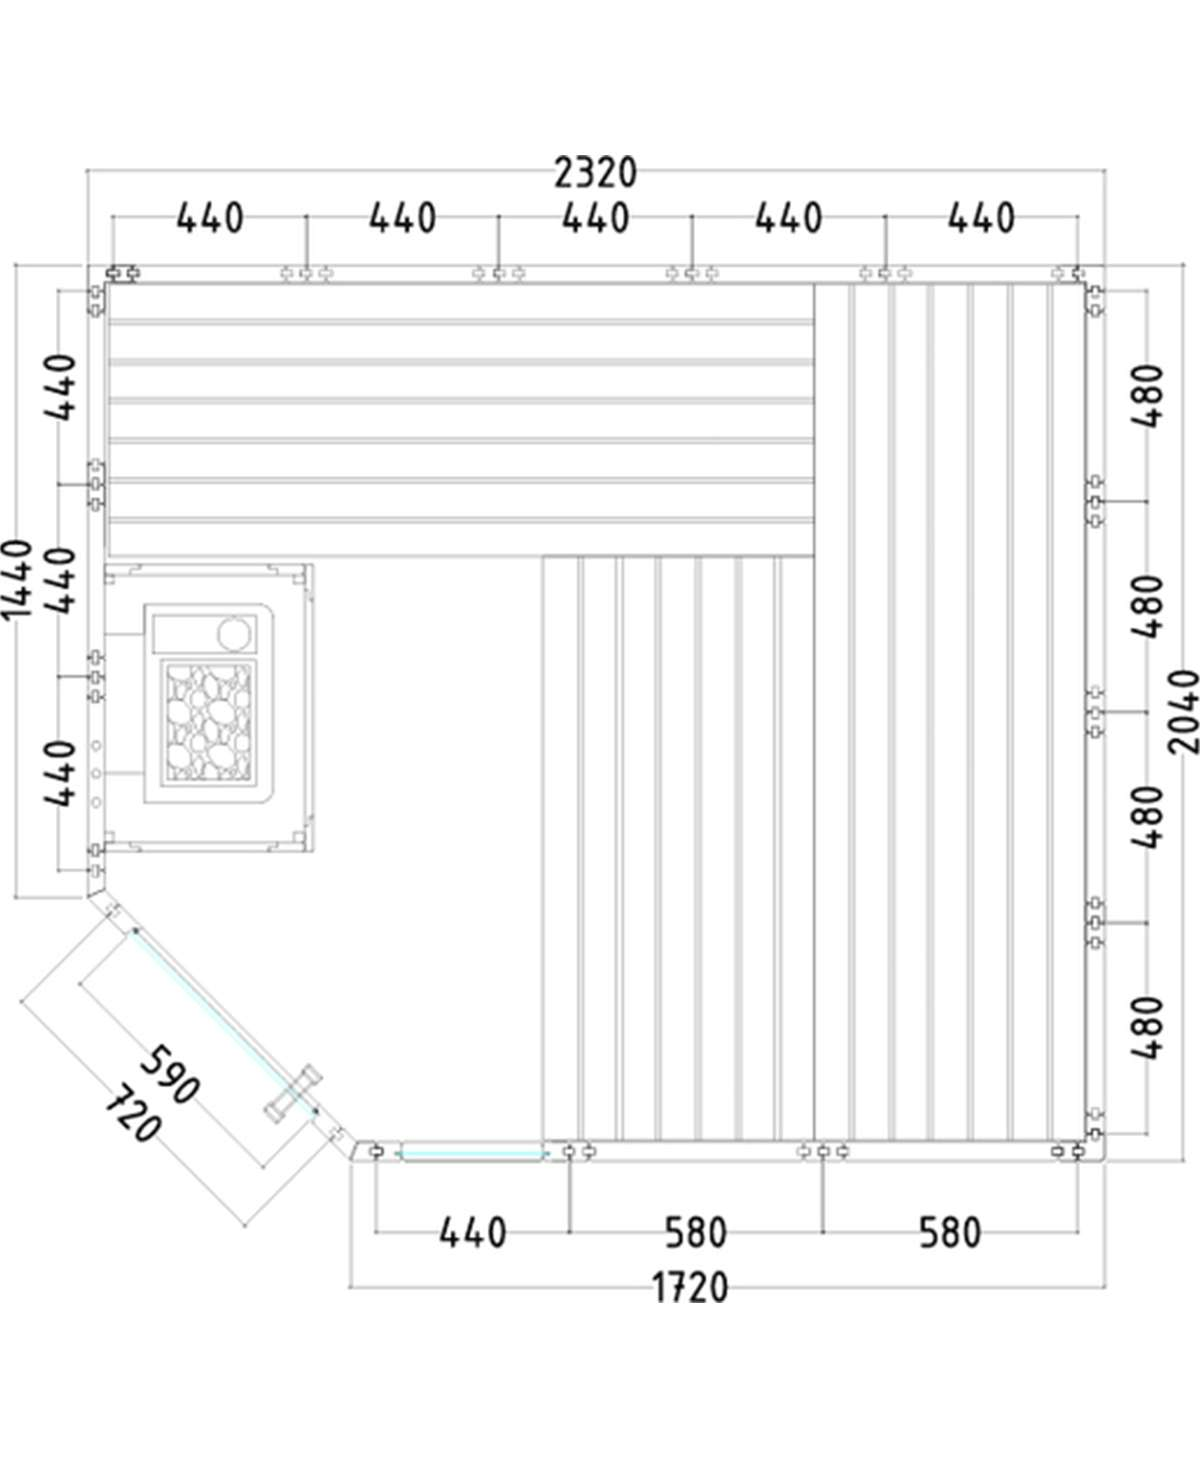 Komfort corner large grundriss